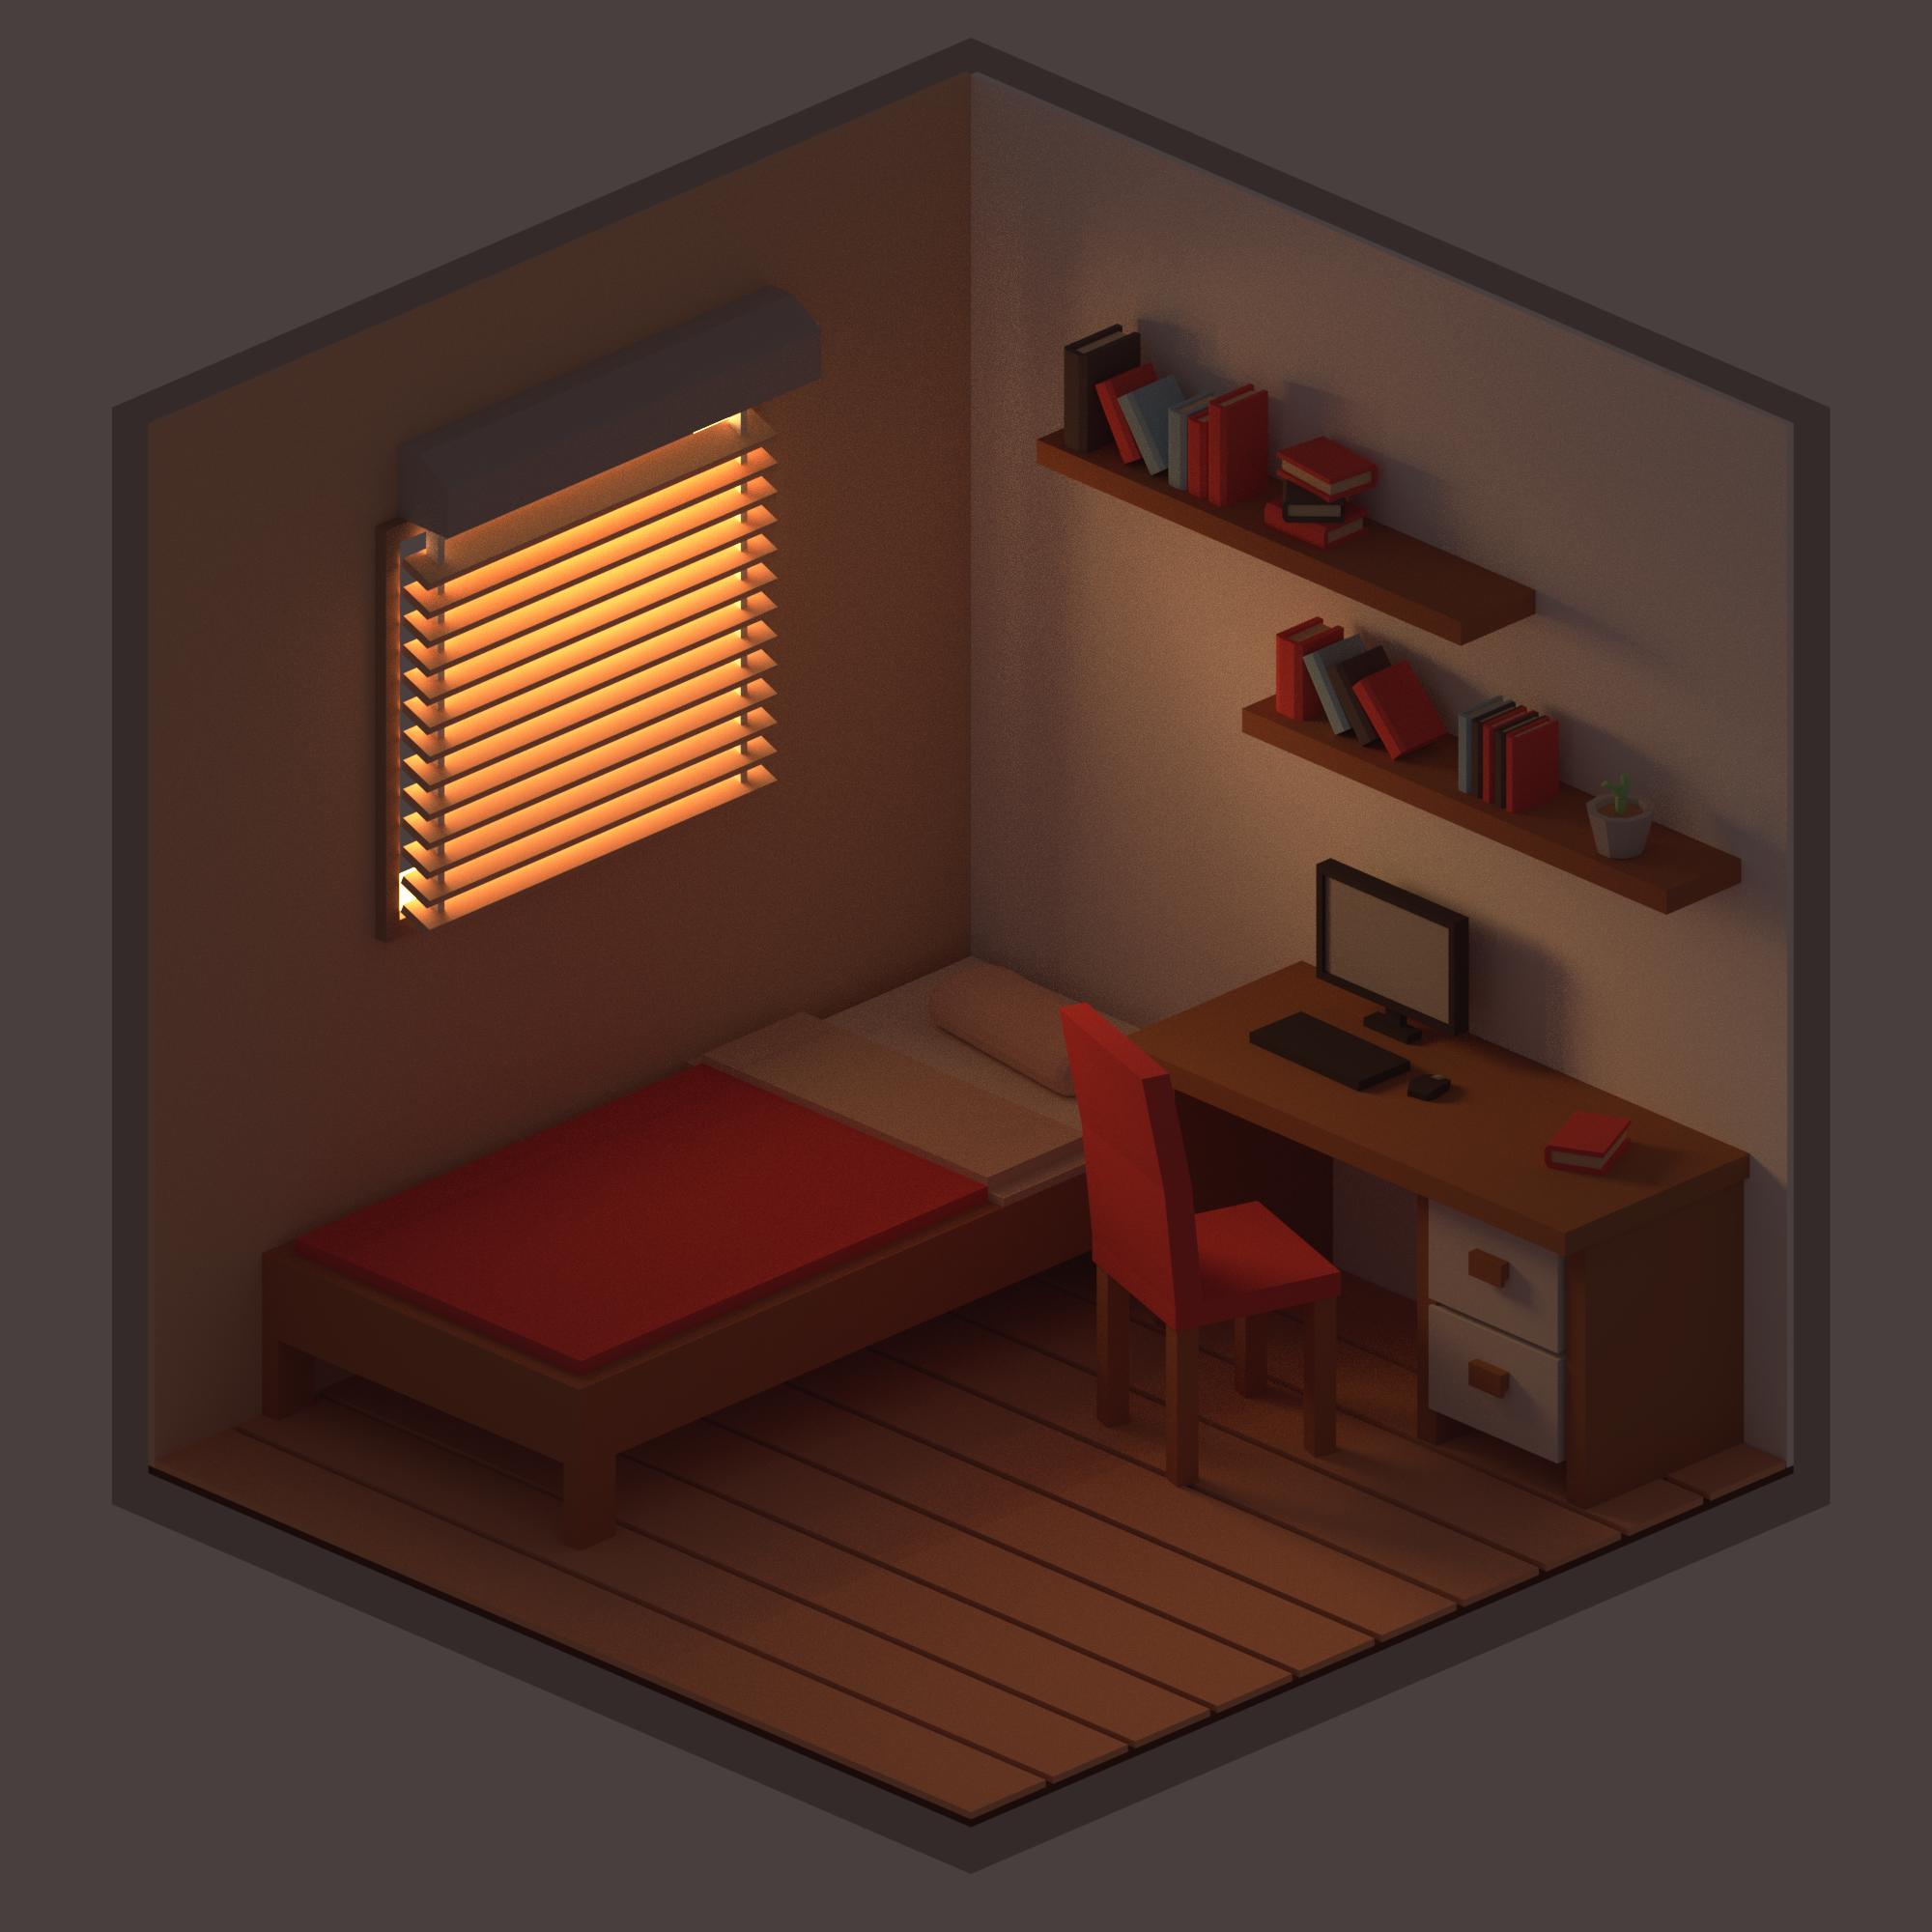 ISOMETRIC BEDROOM in 2019 | Isometric art, Isometric ... on Bedroom Reference  id=79477